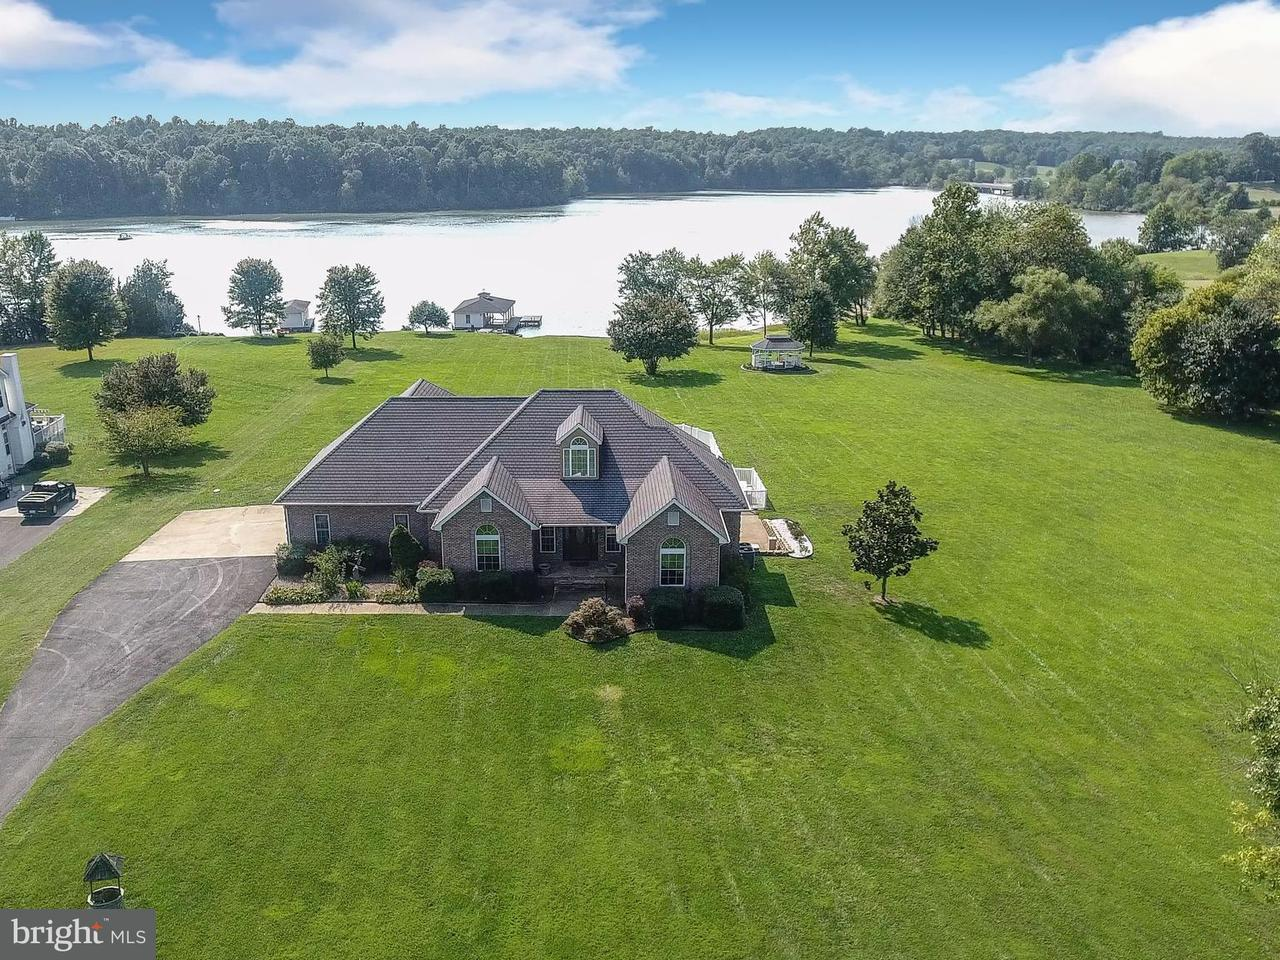 独户住宅 为 销售 在 6834 Lake Pointe Drive 6834 Lake Pointe Drive Mineral, 弗吉尼亚州 23117 美国